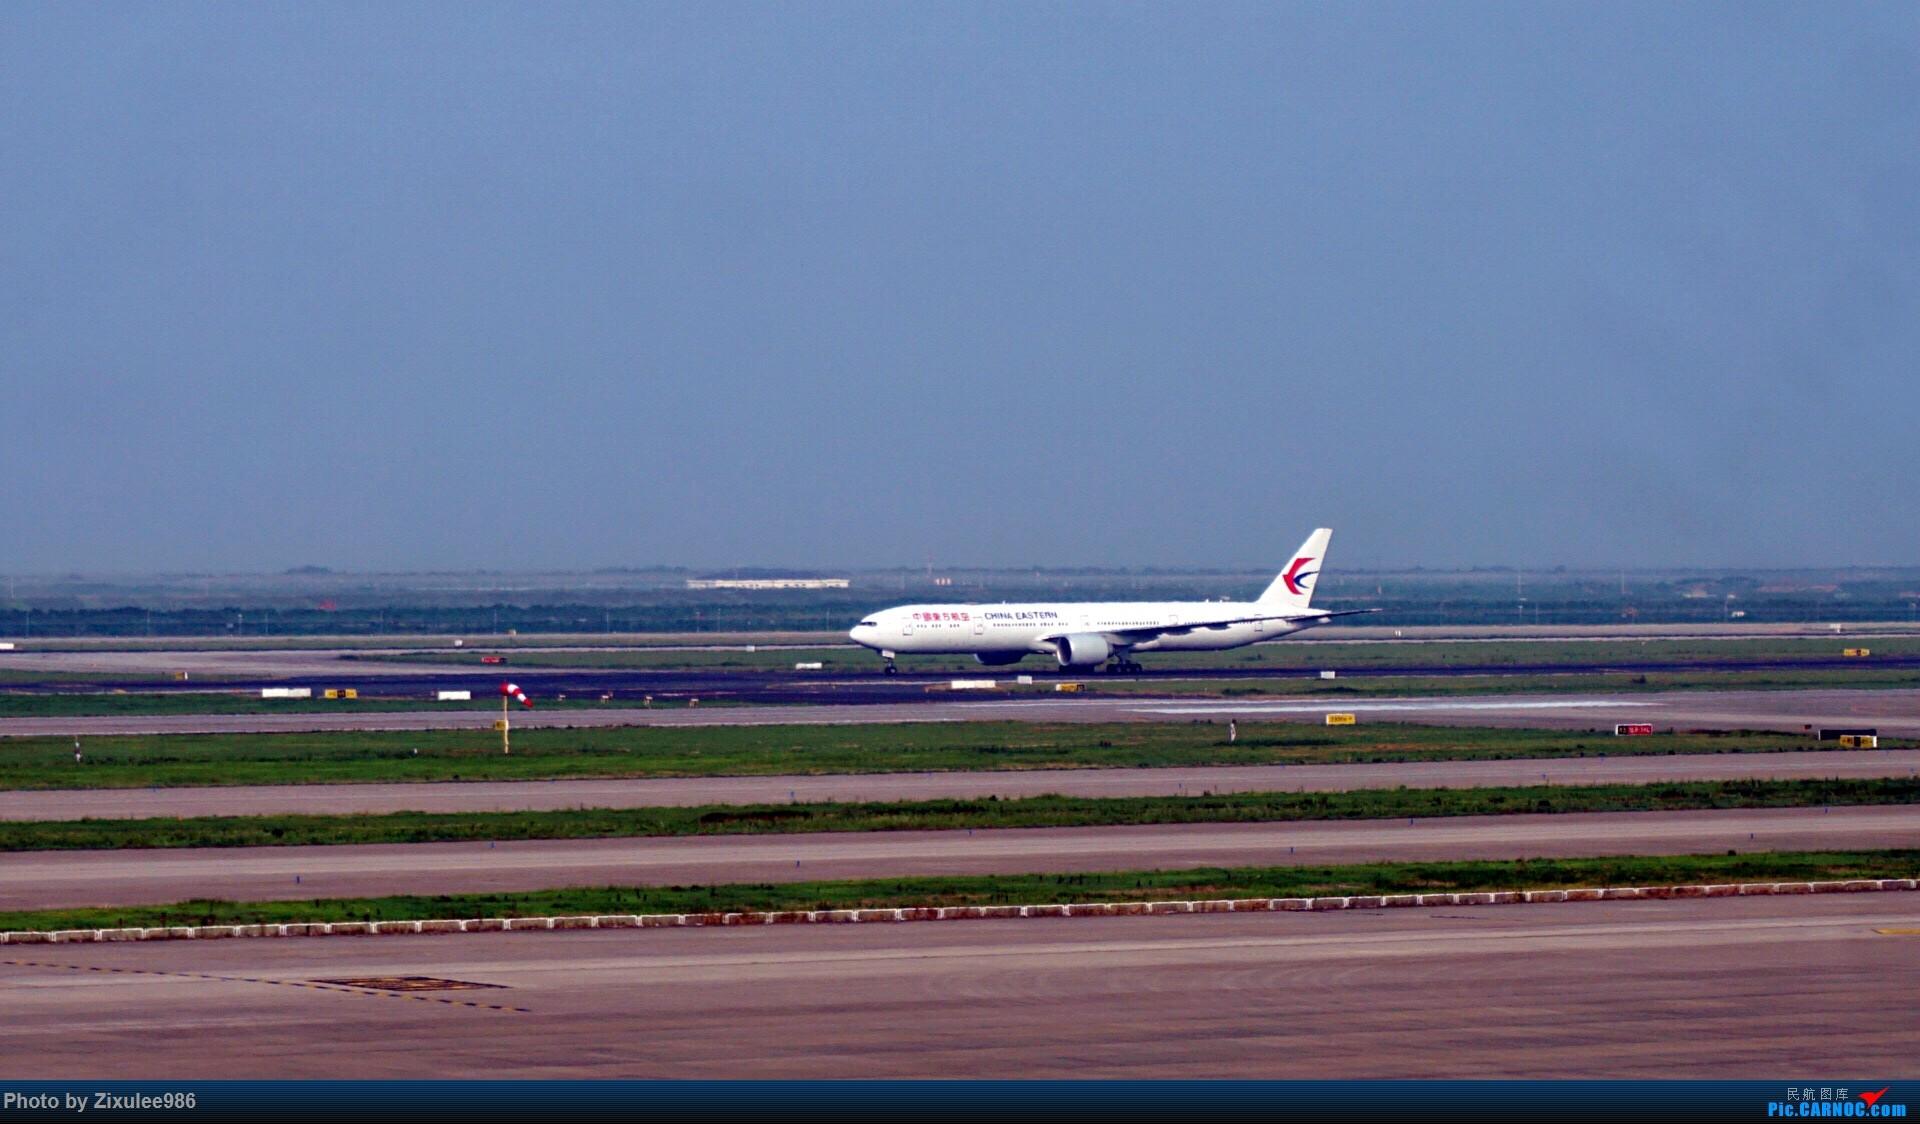 Re:[原创]加拿大21日游学之旅(一)~JJN-PVG-YYZ..(内含flightlog)~第一次发游记~多图缓更请谅解 BOEING 777-39P (ER) B-2023 中国上海浦东国际机场